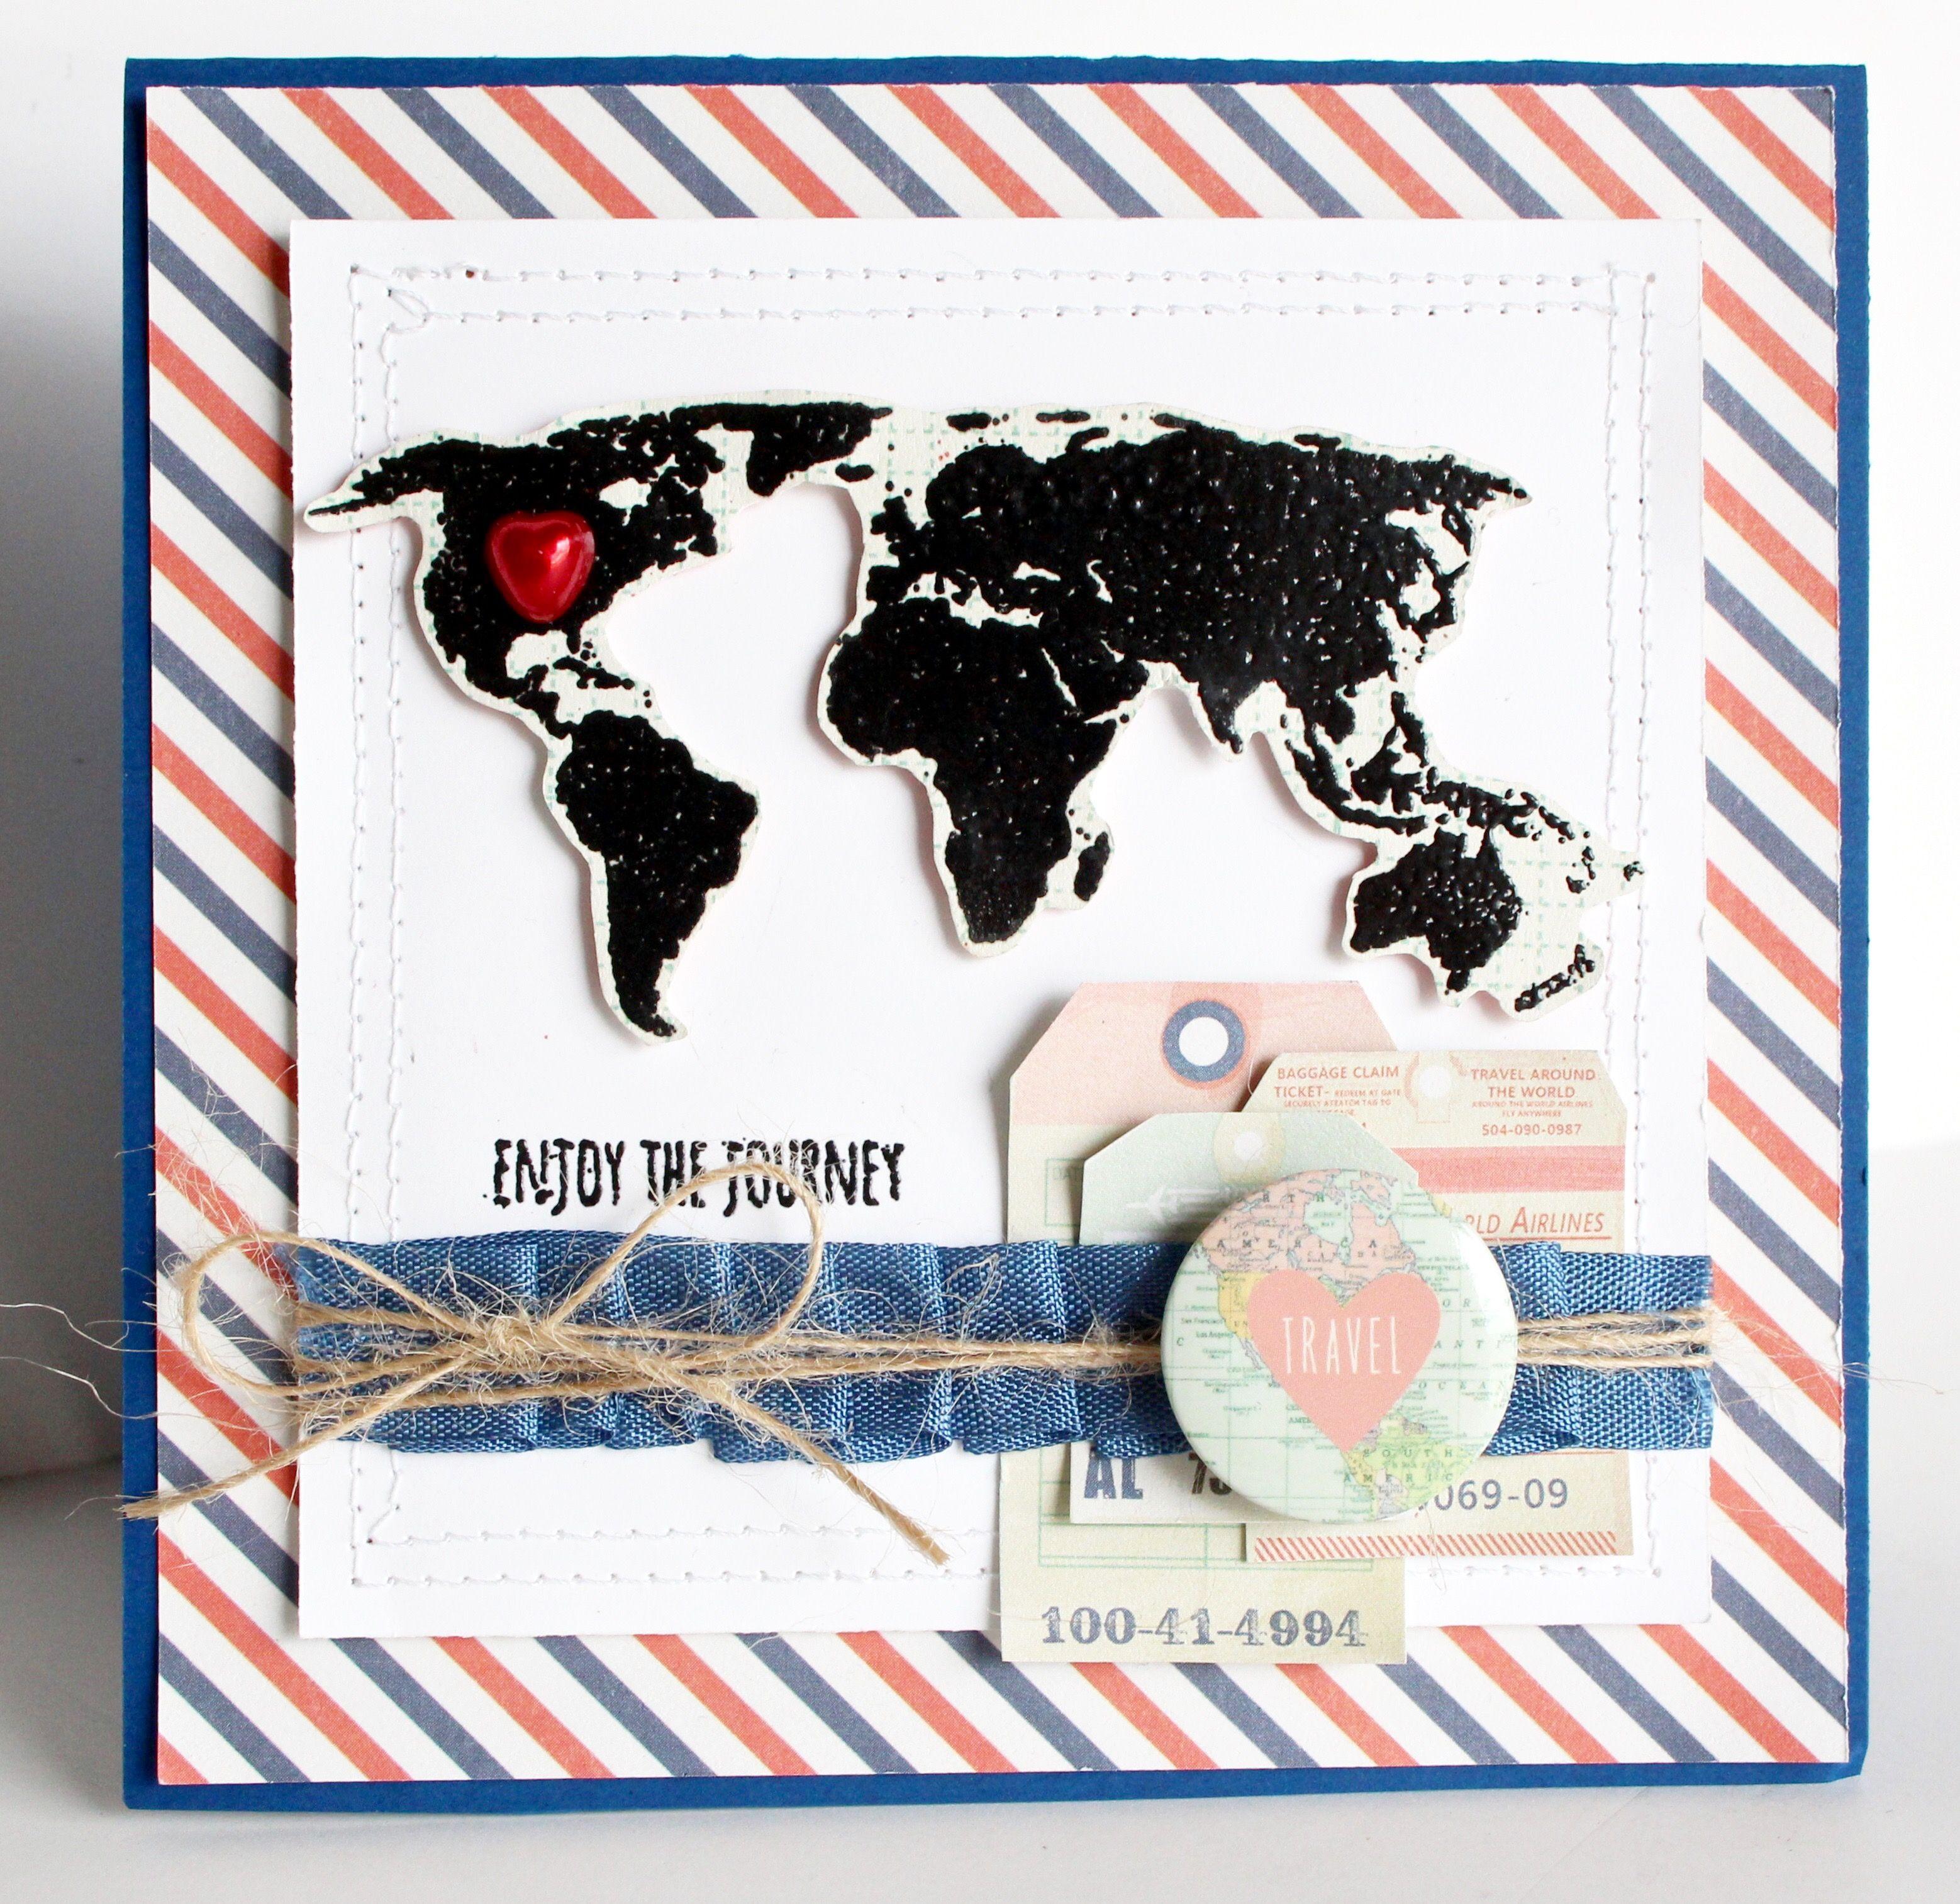 Journey scrapbook ideas - Enjoy The Journey Scrapbook Com Fabulous Handmade Bon Voyage Card